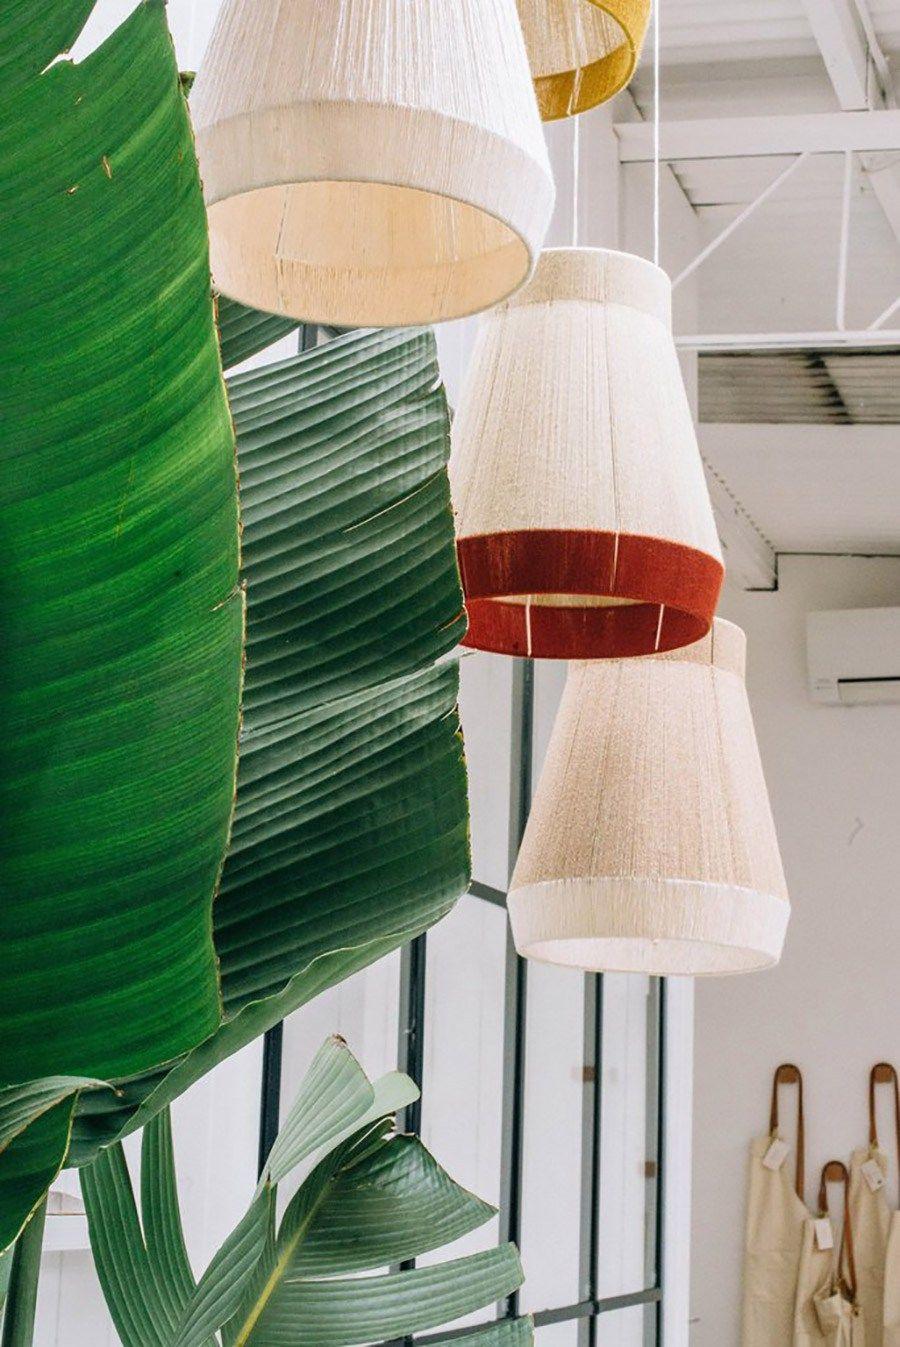 Inspiración: Lámparas tejidas  Idee salon, Abat jour, Deco